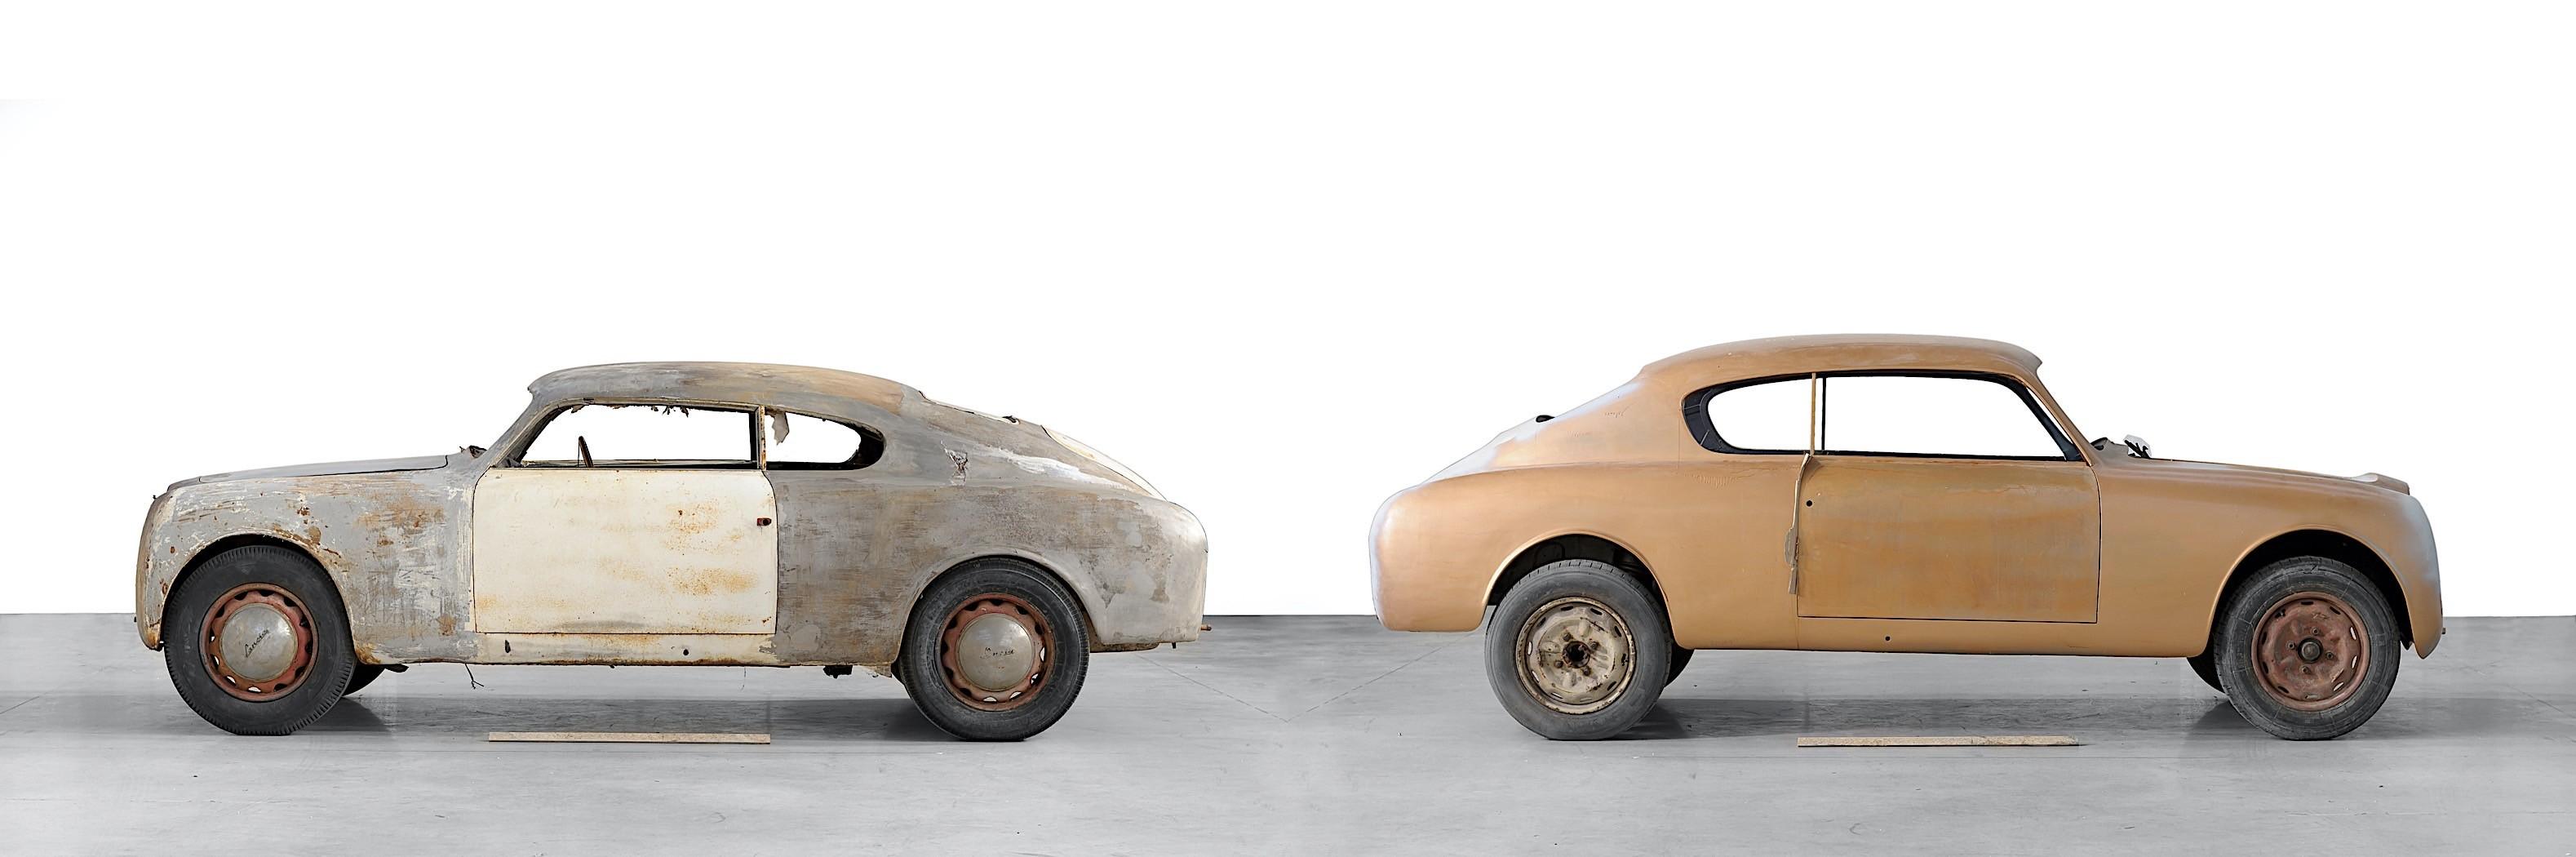 Restored-Lancia-Aurelia-B20GT-14